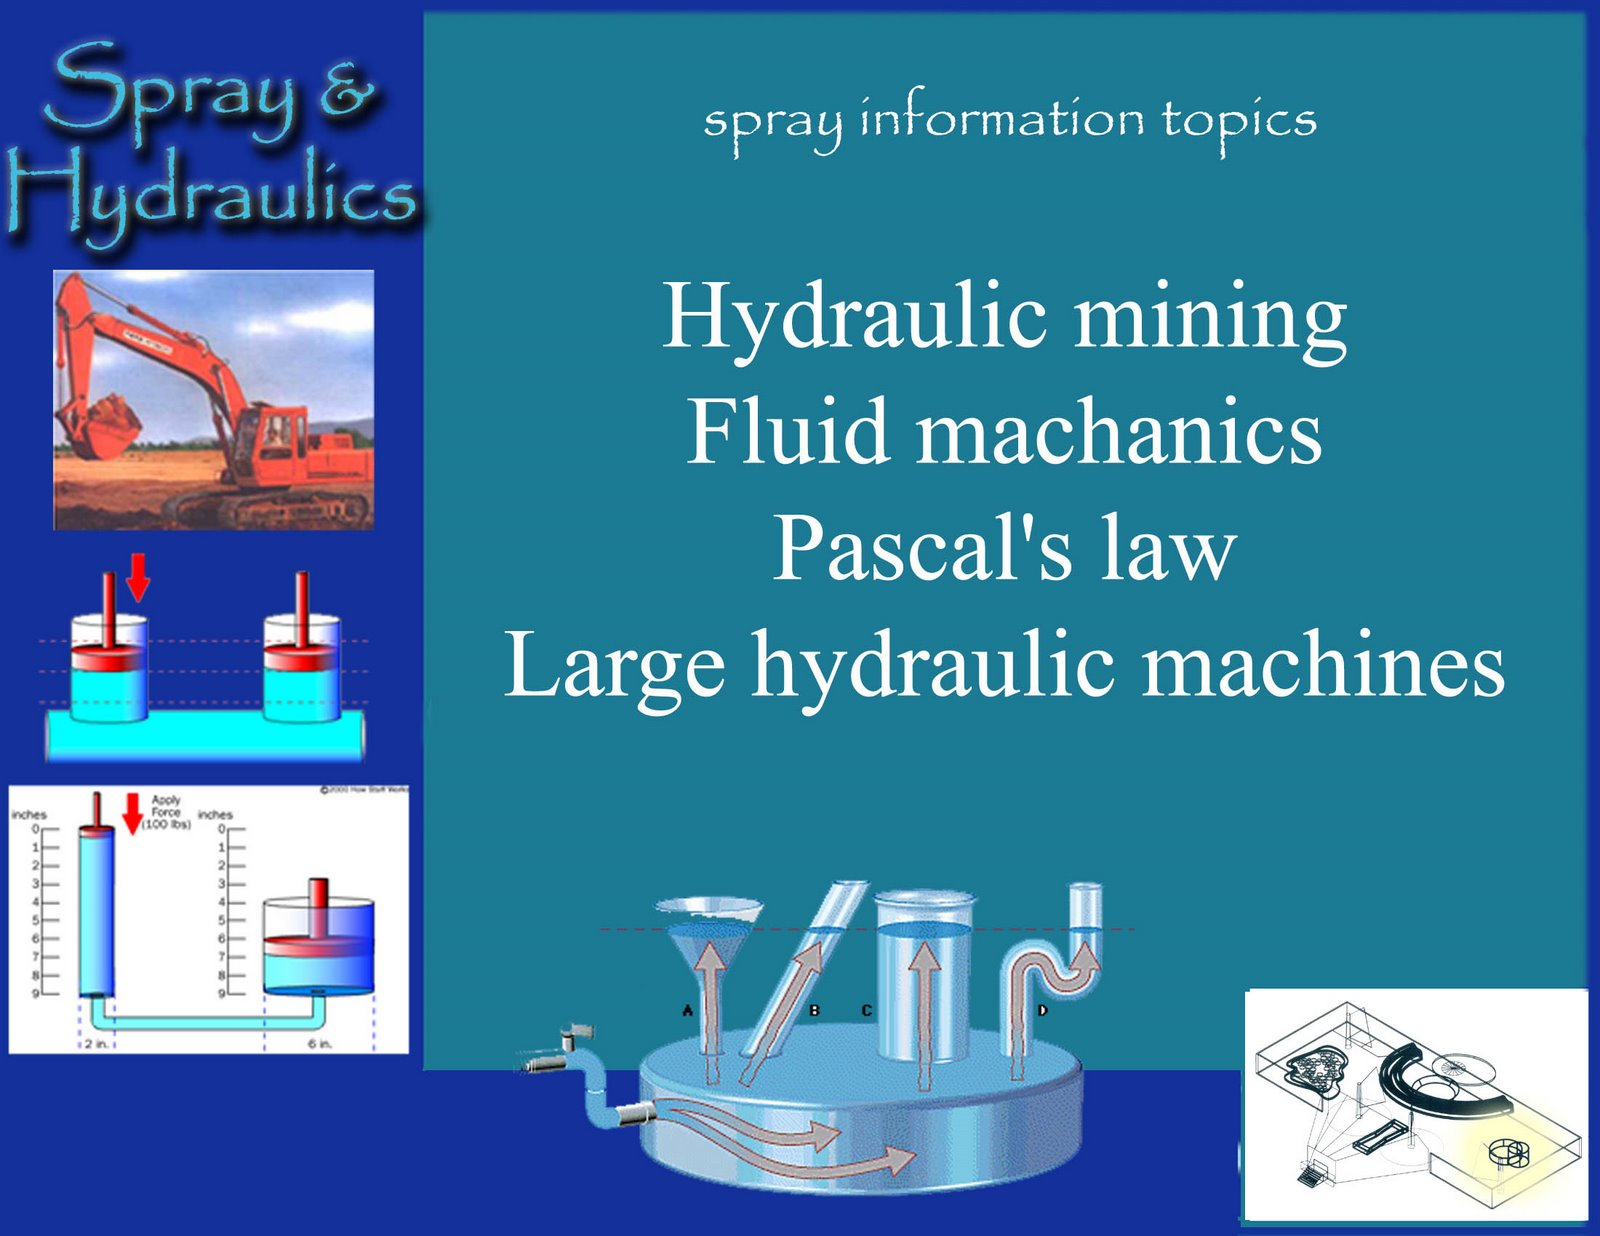 Spray and Hydraulic information topics